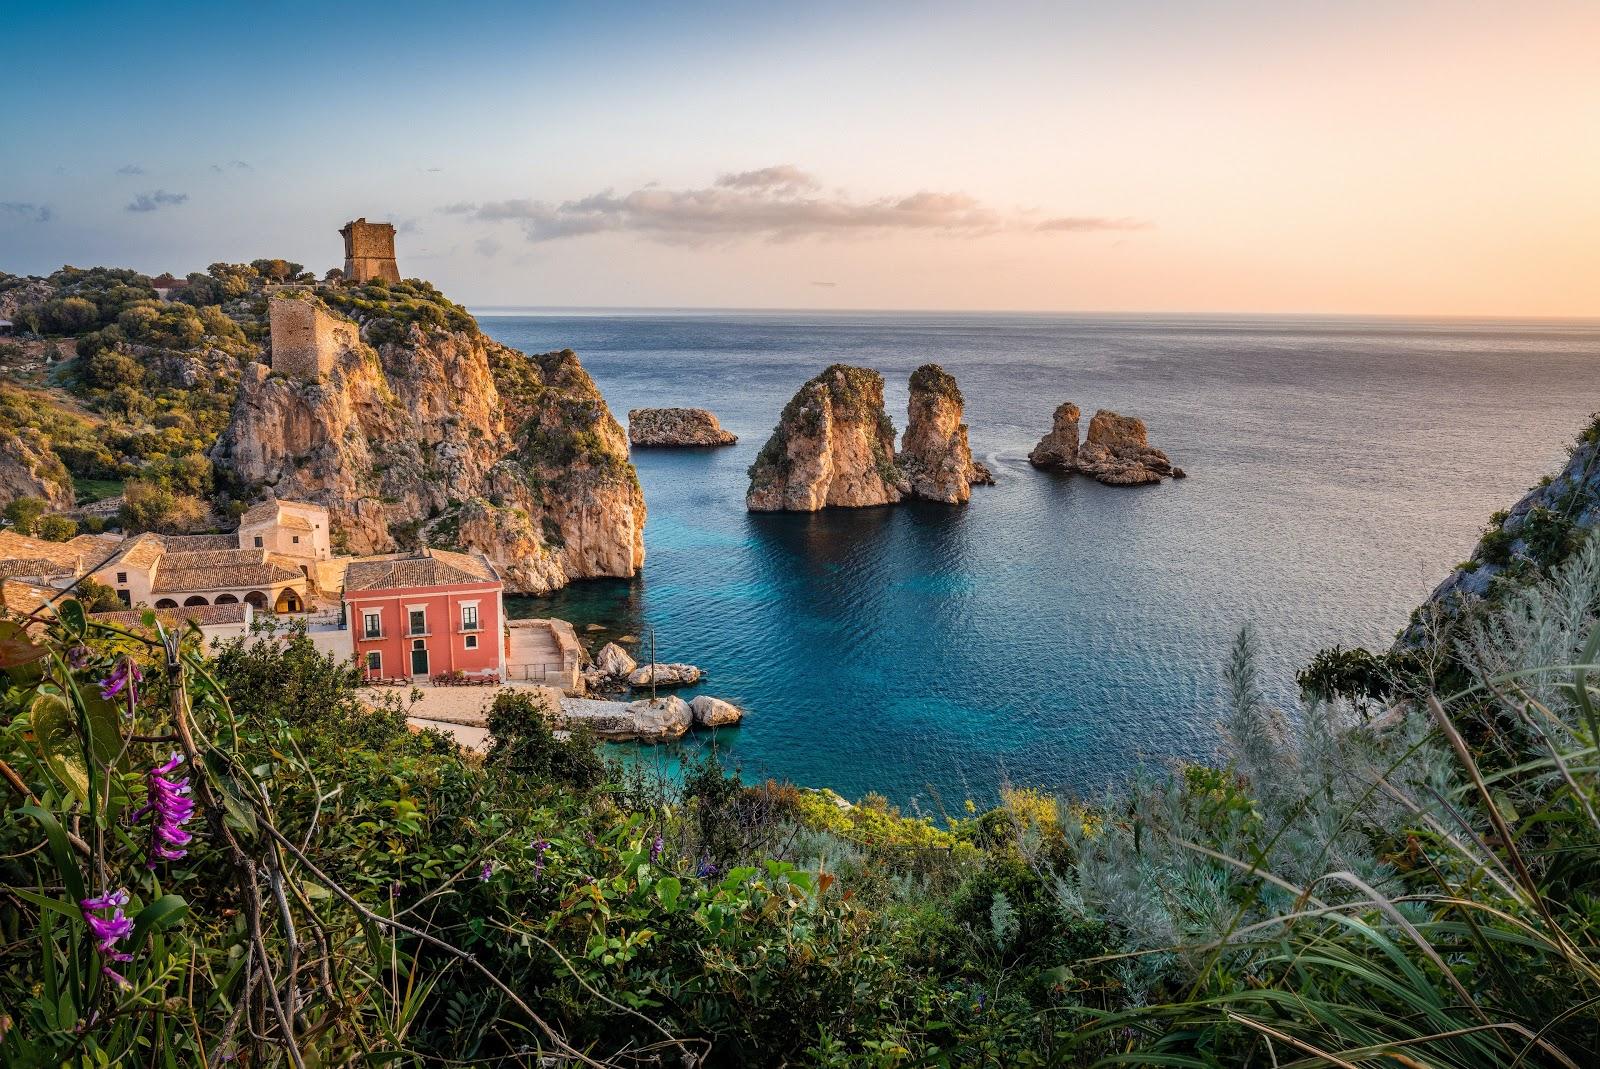 Droomhuis op Sicilië locatie